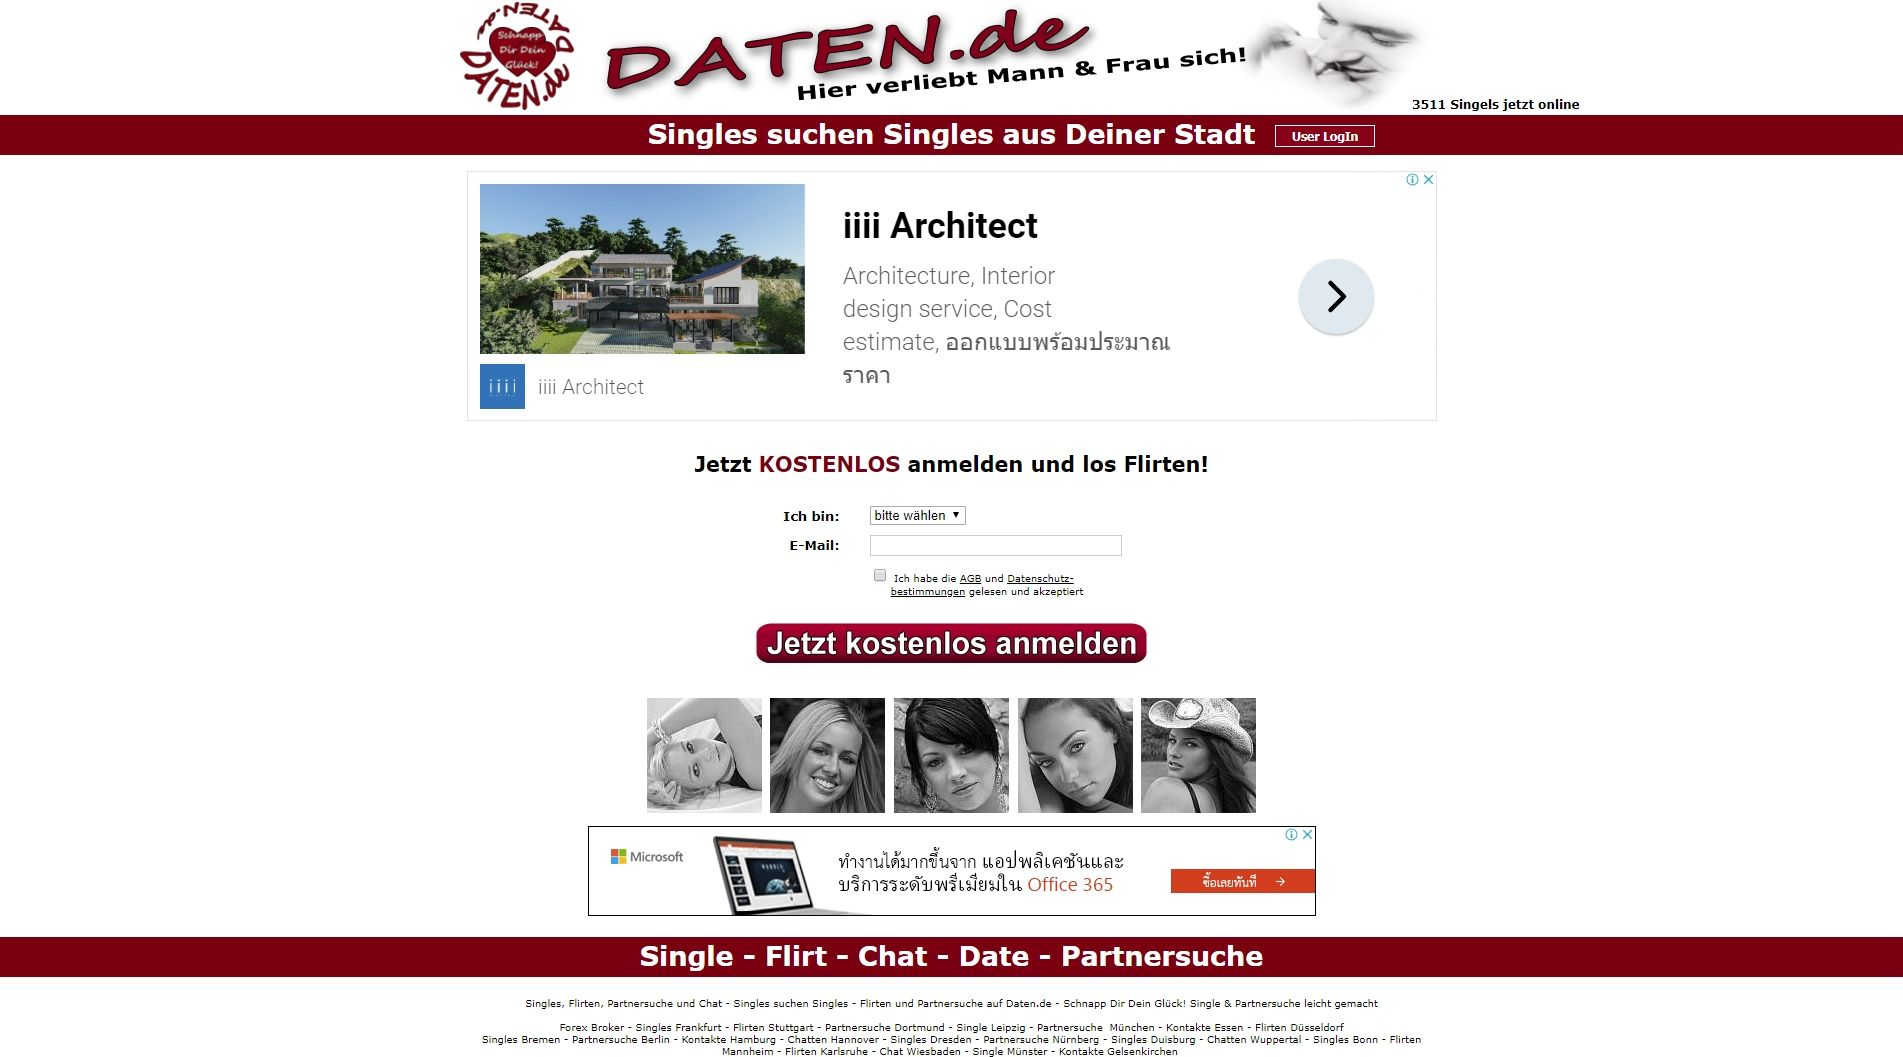 Gratis Dating App & Chat Partnersuche - Date Love Apps